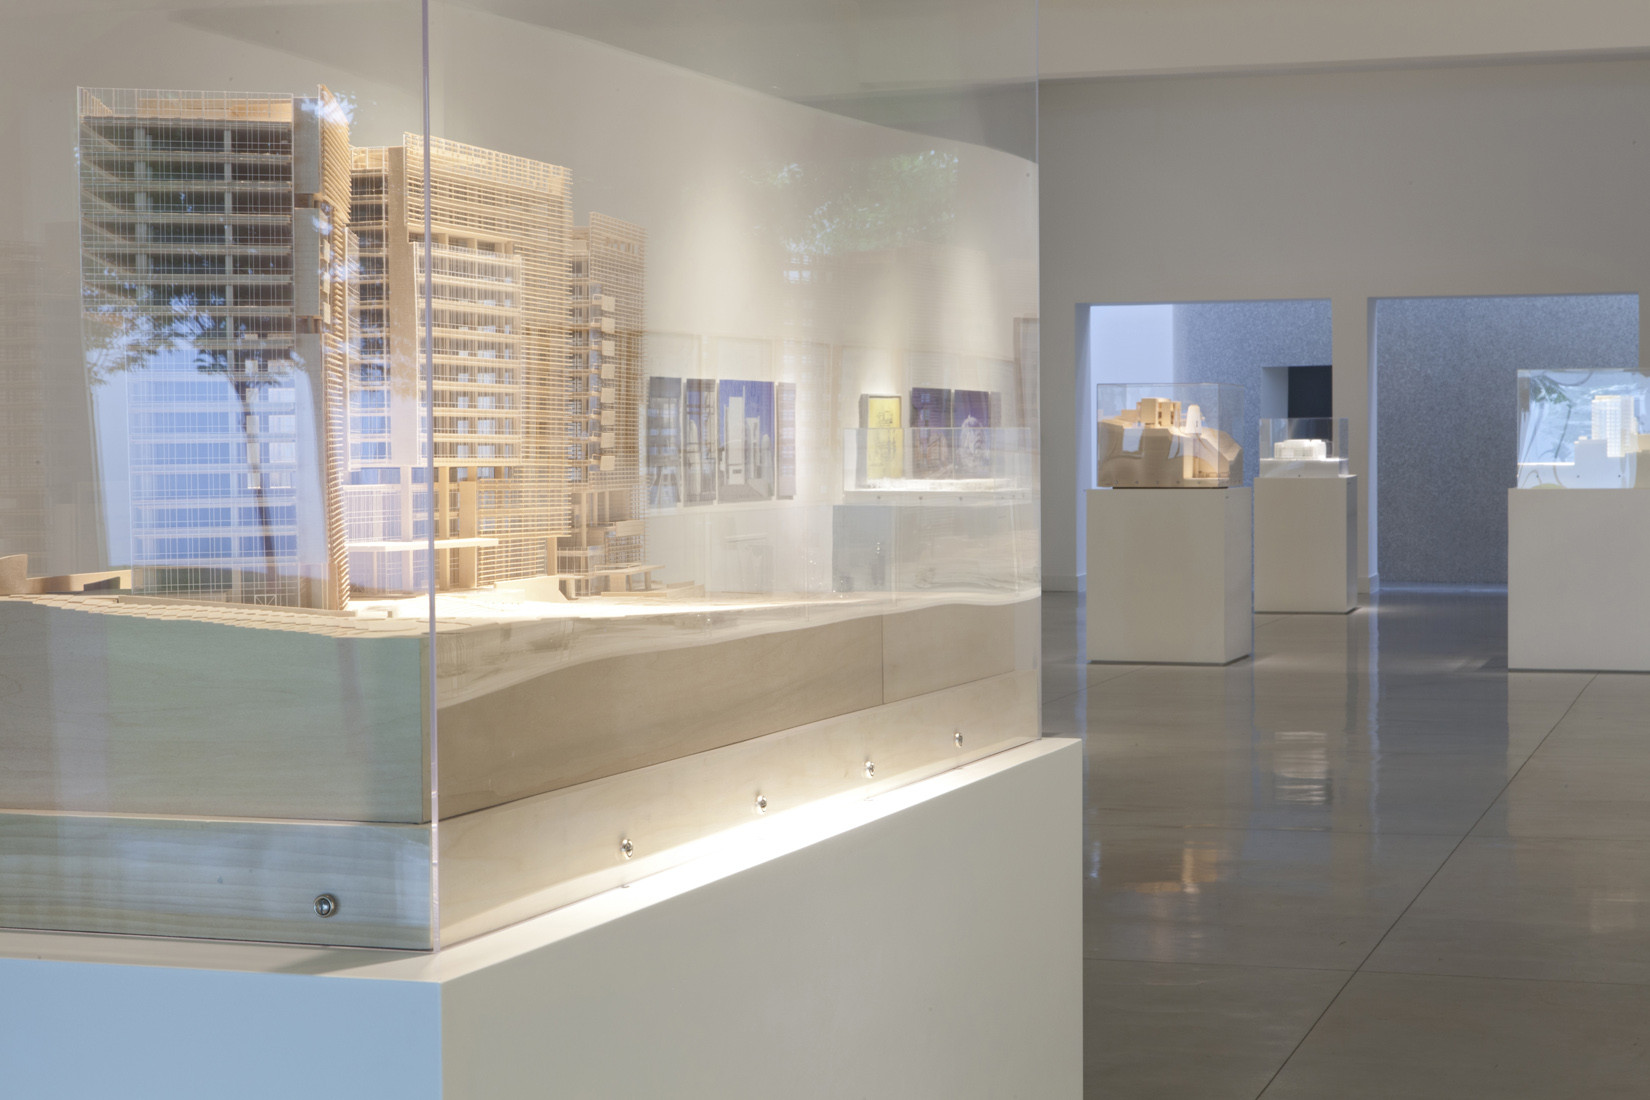 Update: 'Richard Meier – Architecture and Design' Retrospective Exhibition, Courtesy of Fondazione Bisazza + Richard Meier & Partners